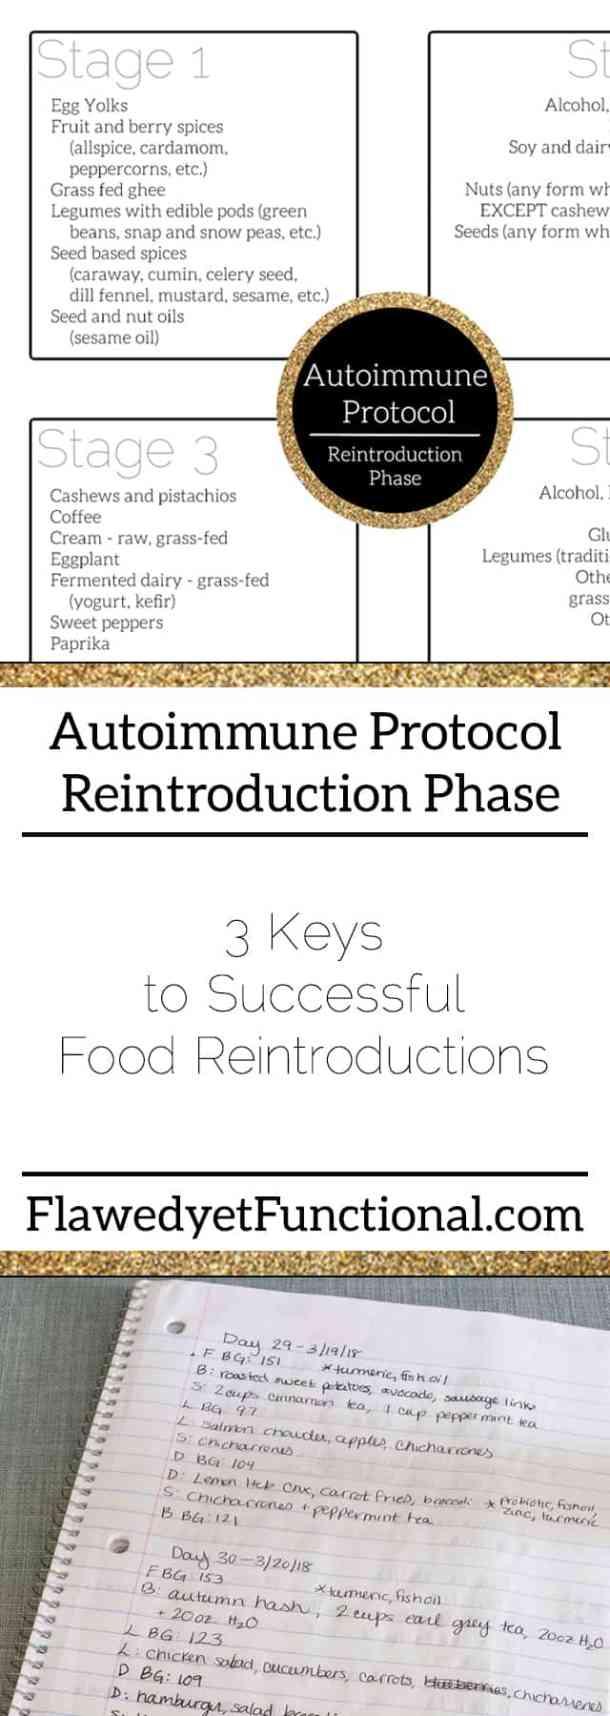 Autoimmune protocol reintroduction phase